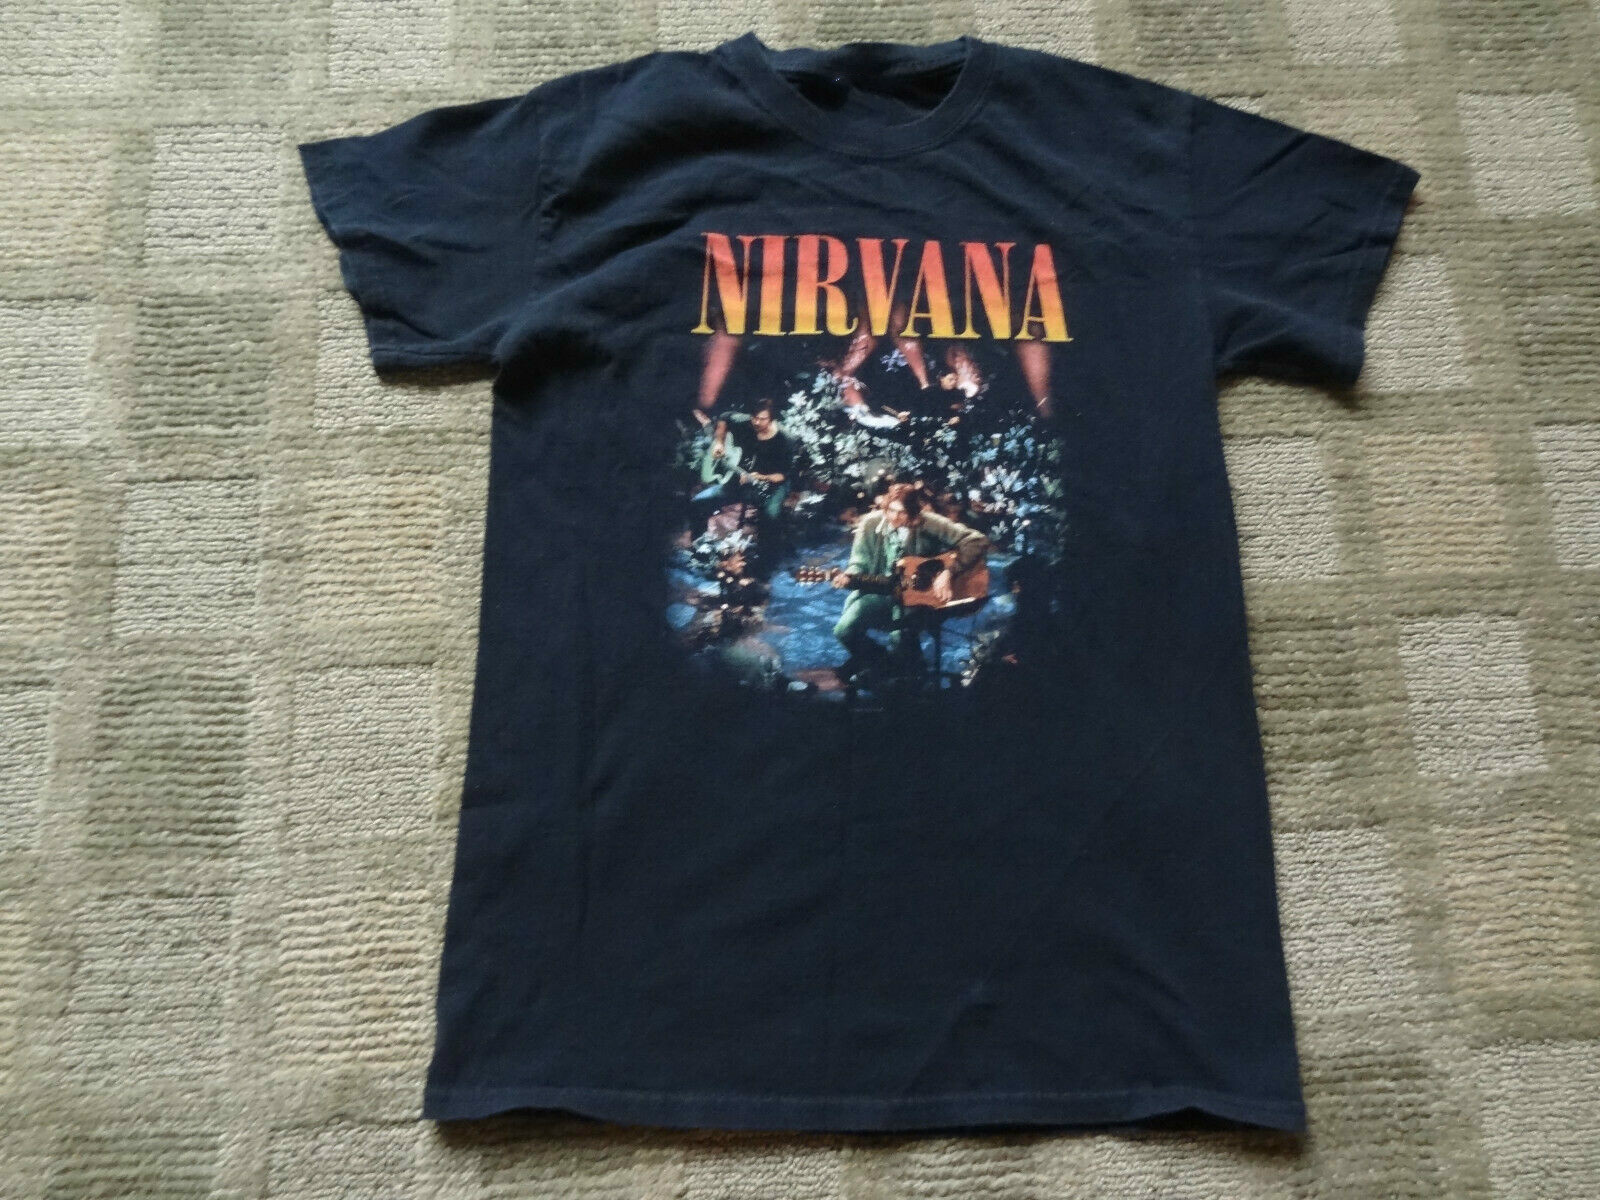 2008 Nirvana Black Unplugged T-Shirt Men's Small Tour Band